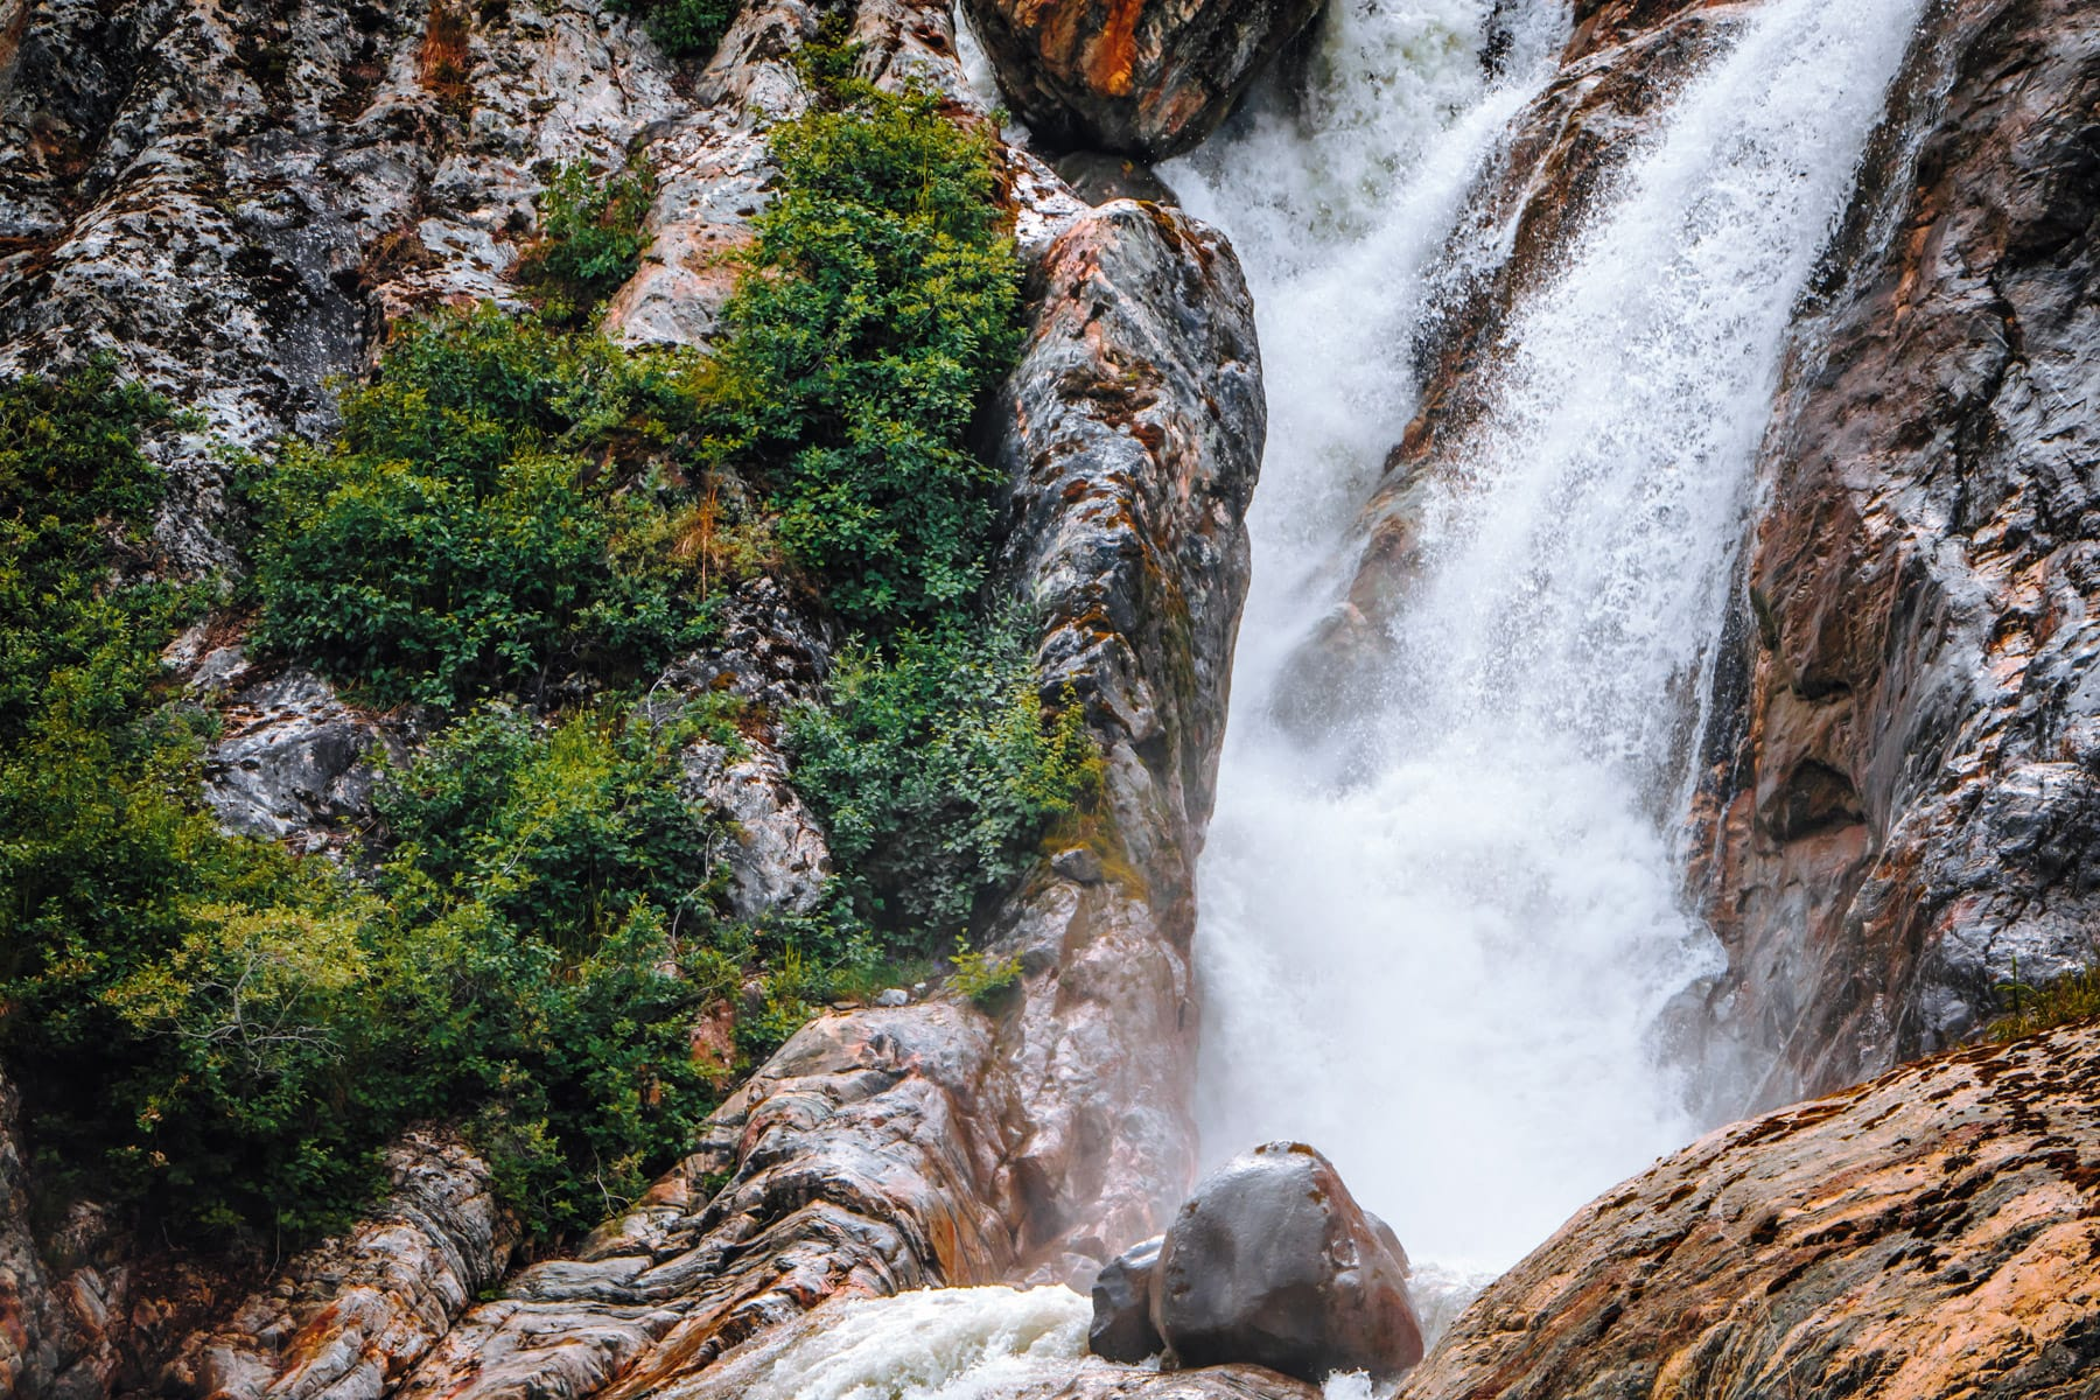 A waterfall along the rocky cliffs along Alaska's Tracy Arm Fjord.